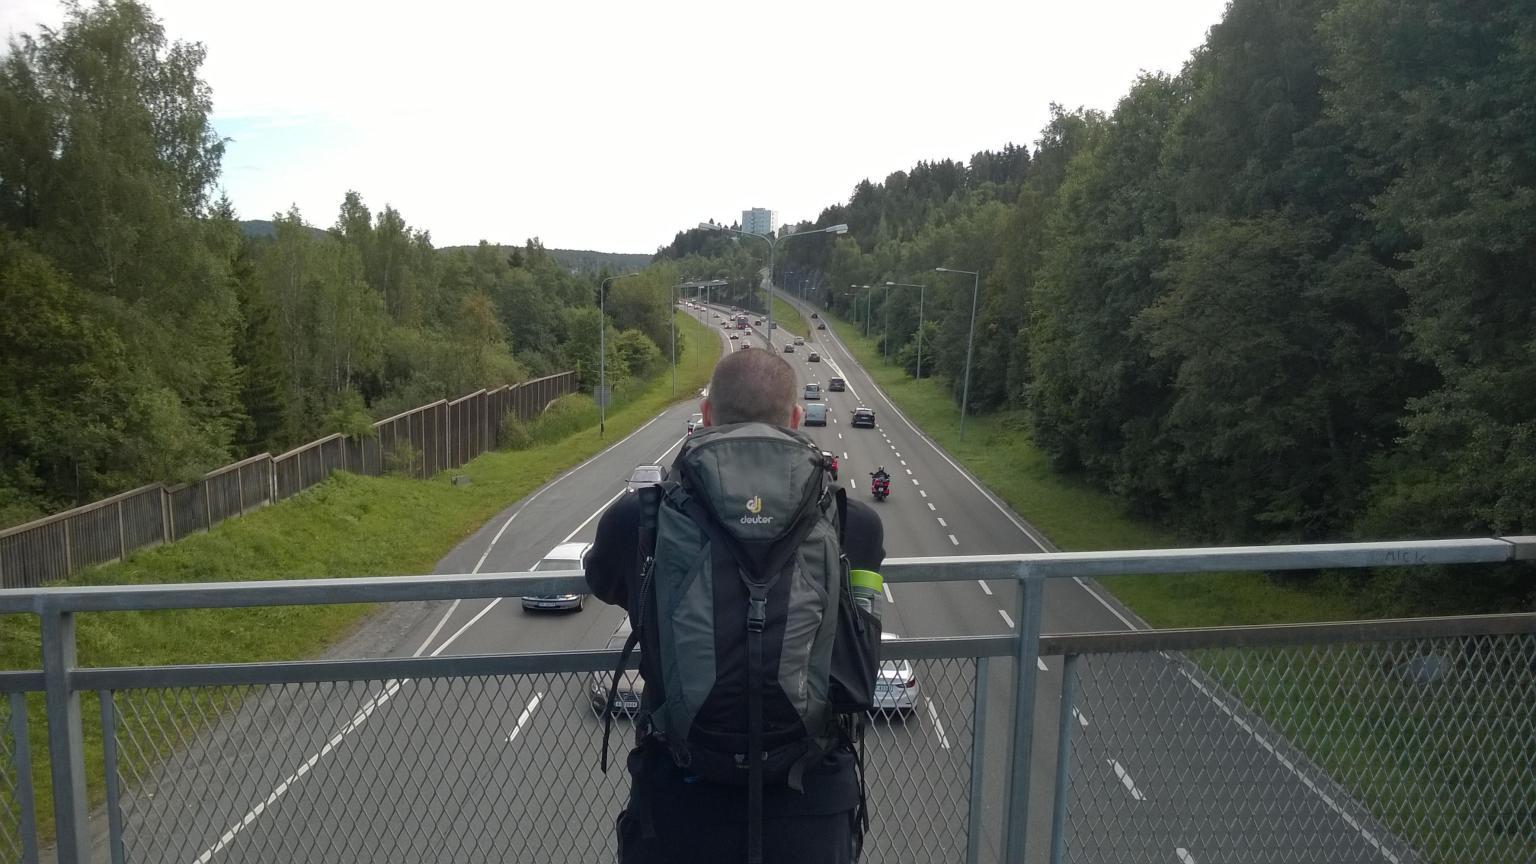 Bruno Pešec on the journey.